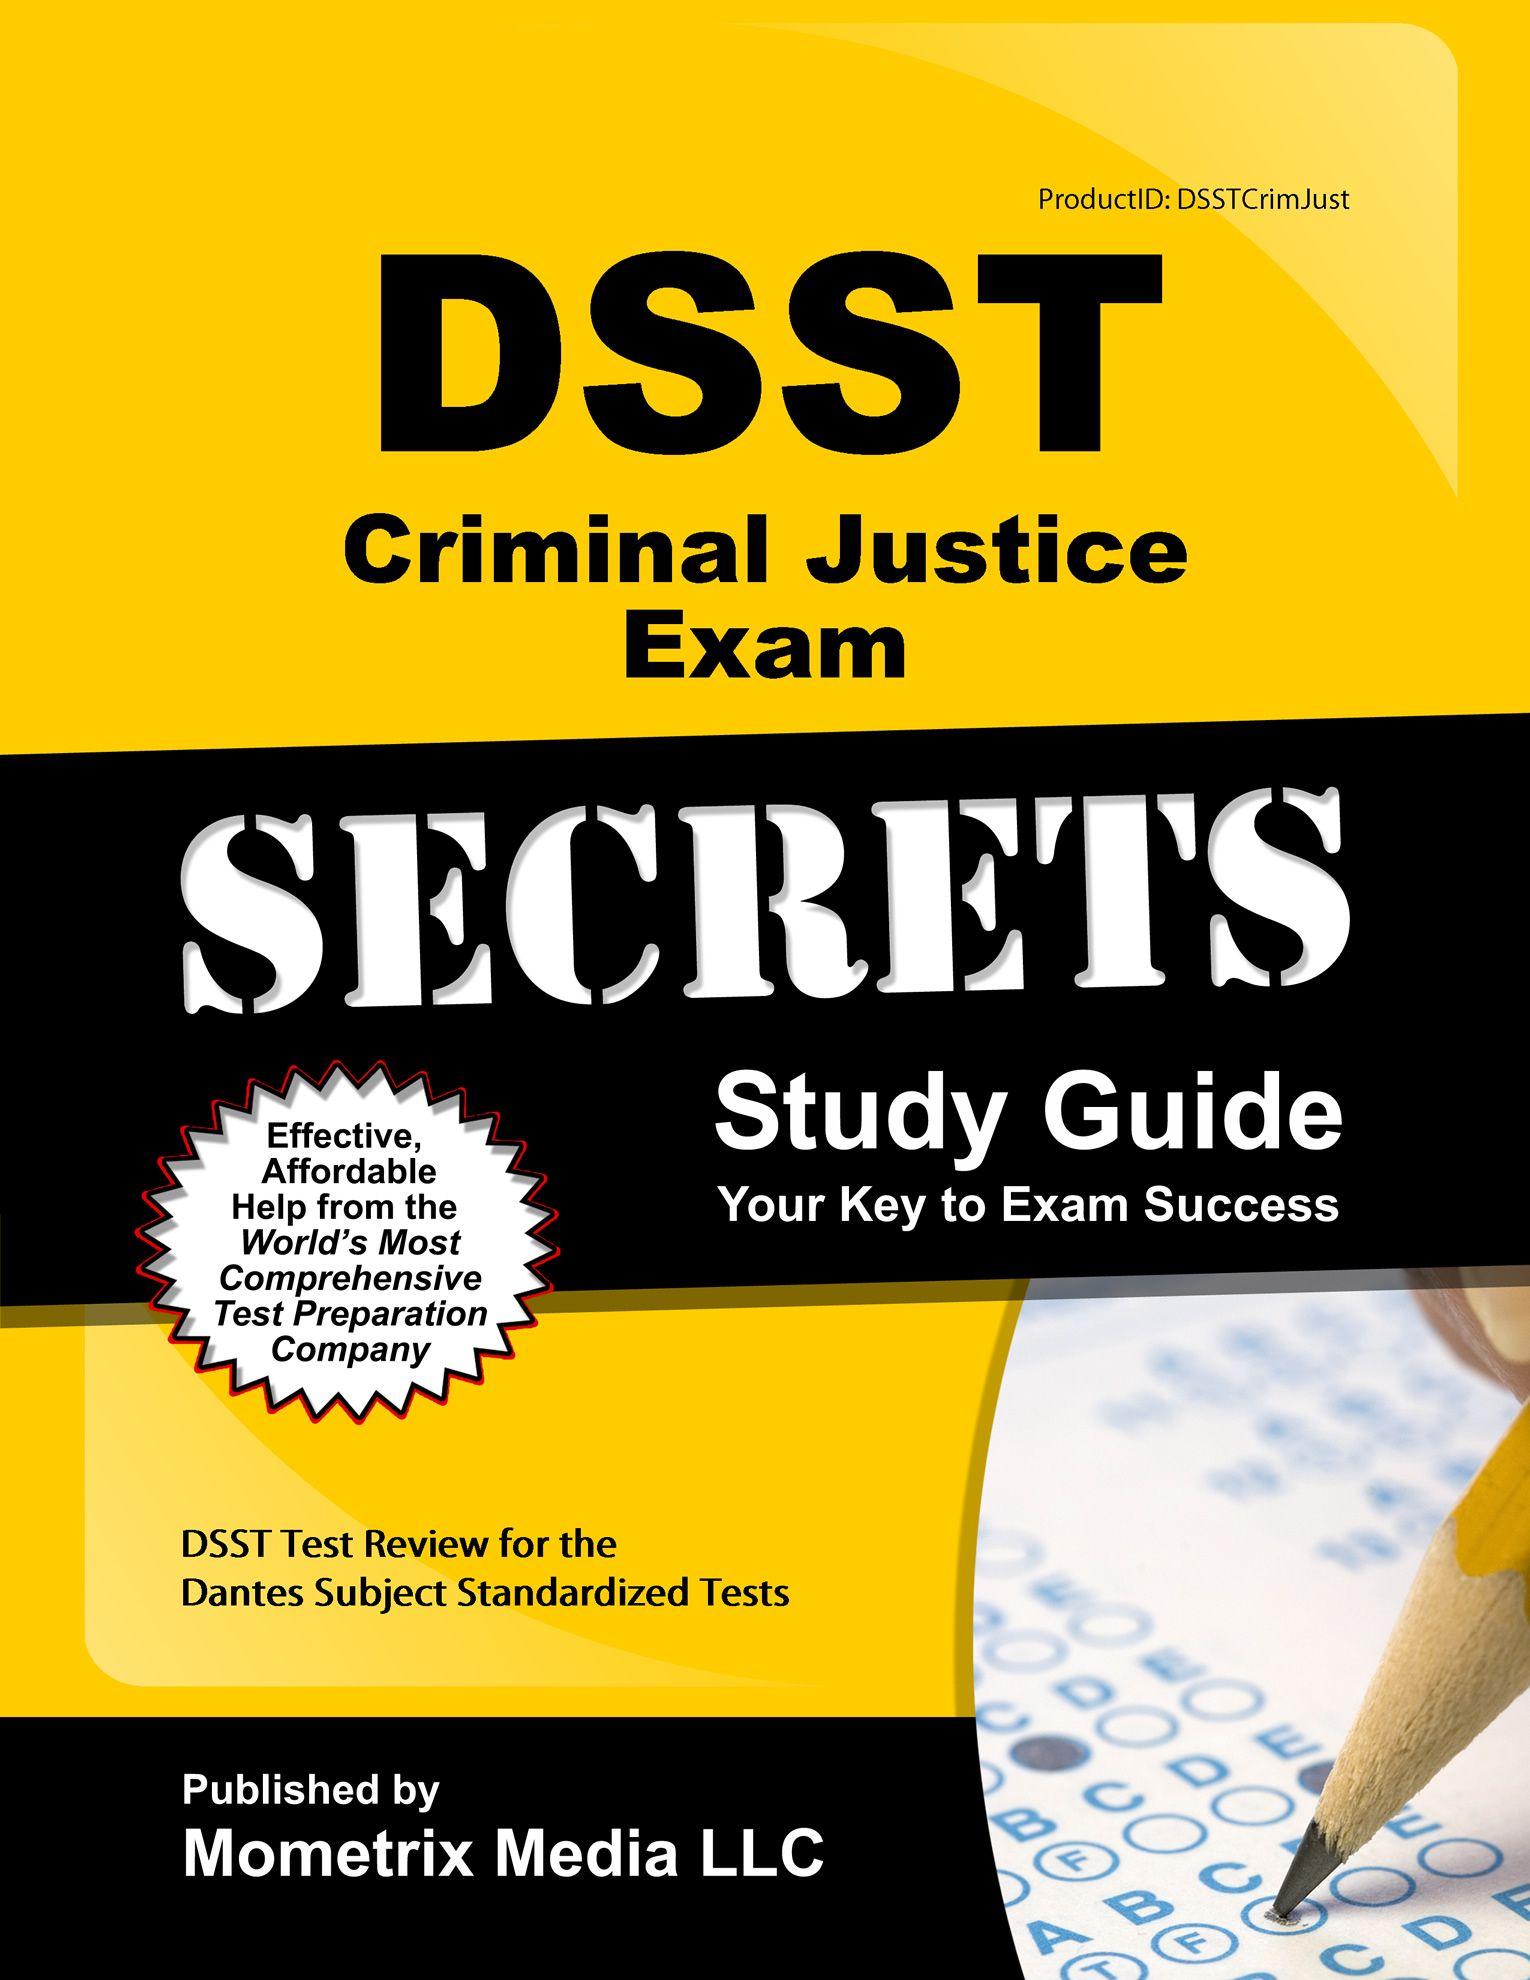 DSST Criminal Justice Exam Study Guide http://www.mo-media.